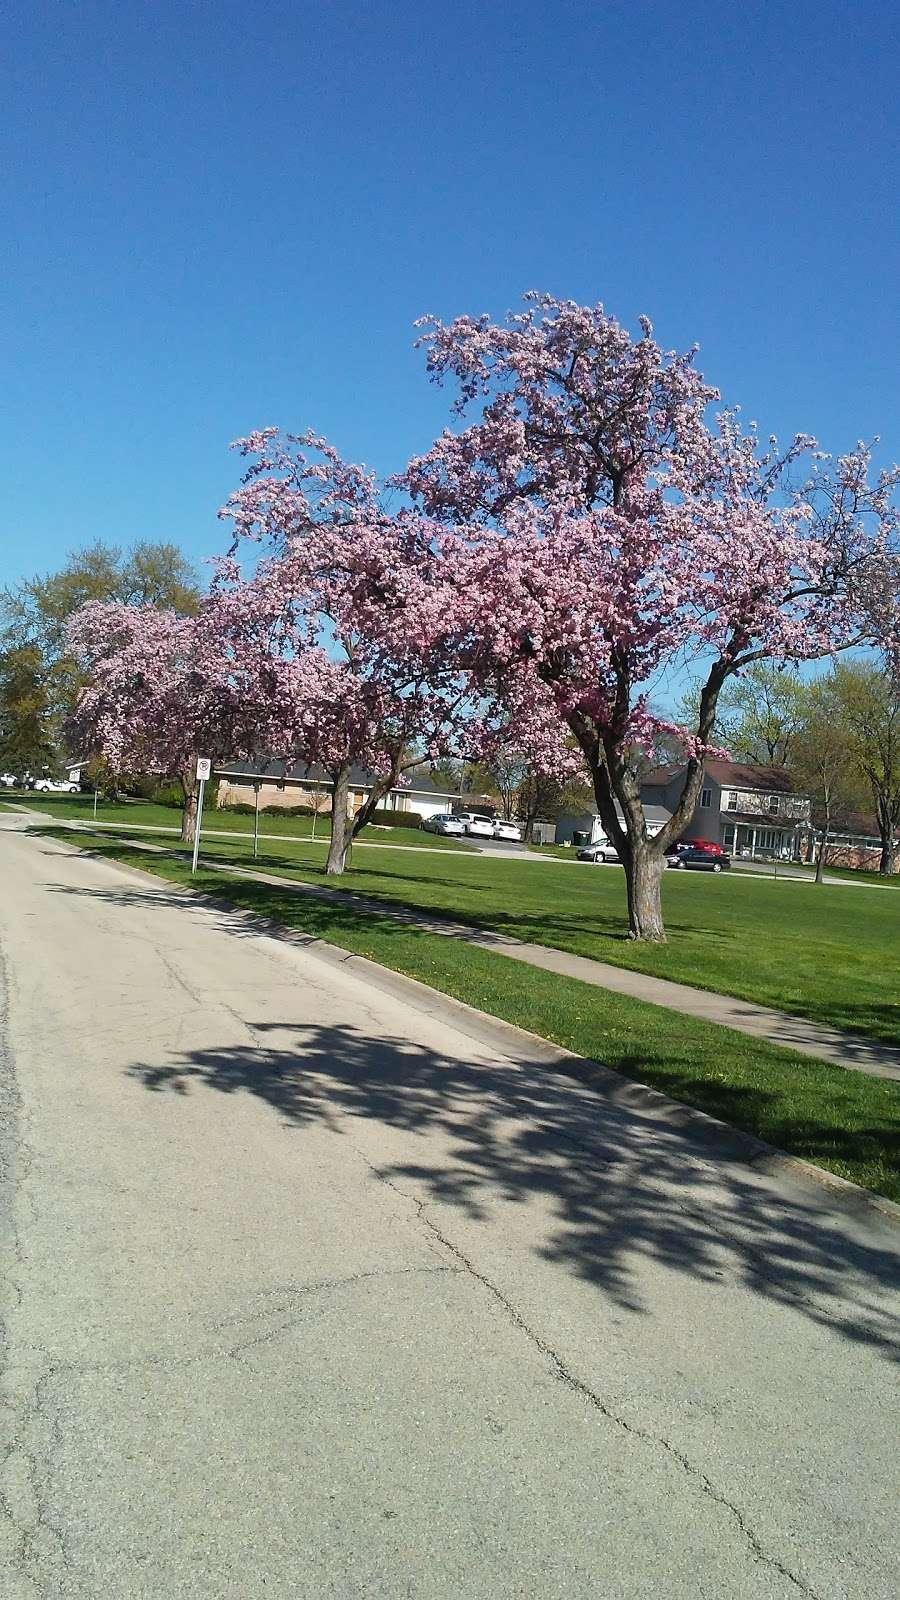 Chino Park - park  | Photo 3 of 10 | Address: 630 Illinois Blvd, Hoffman Estates, IL 60169, USA | Phone: (847) 885-7500